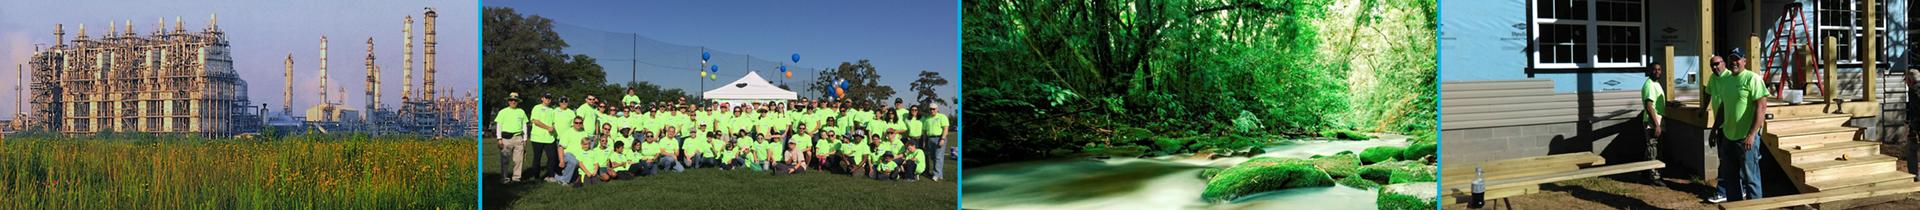 Environmental Stewardship - Alz River